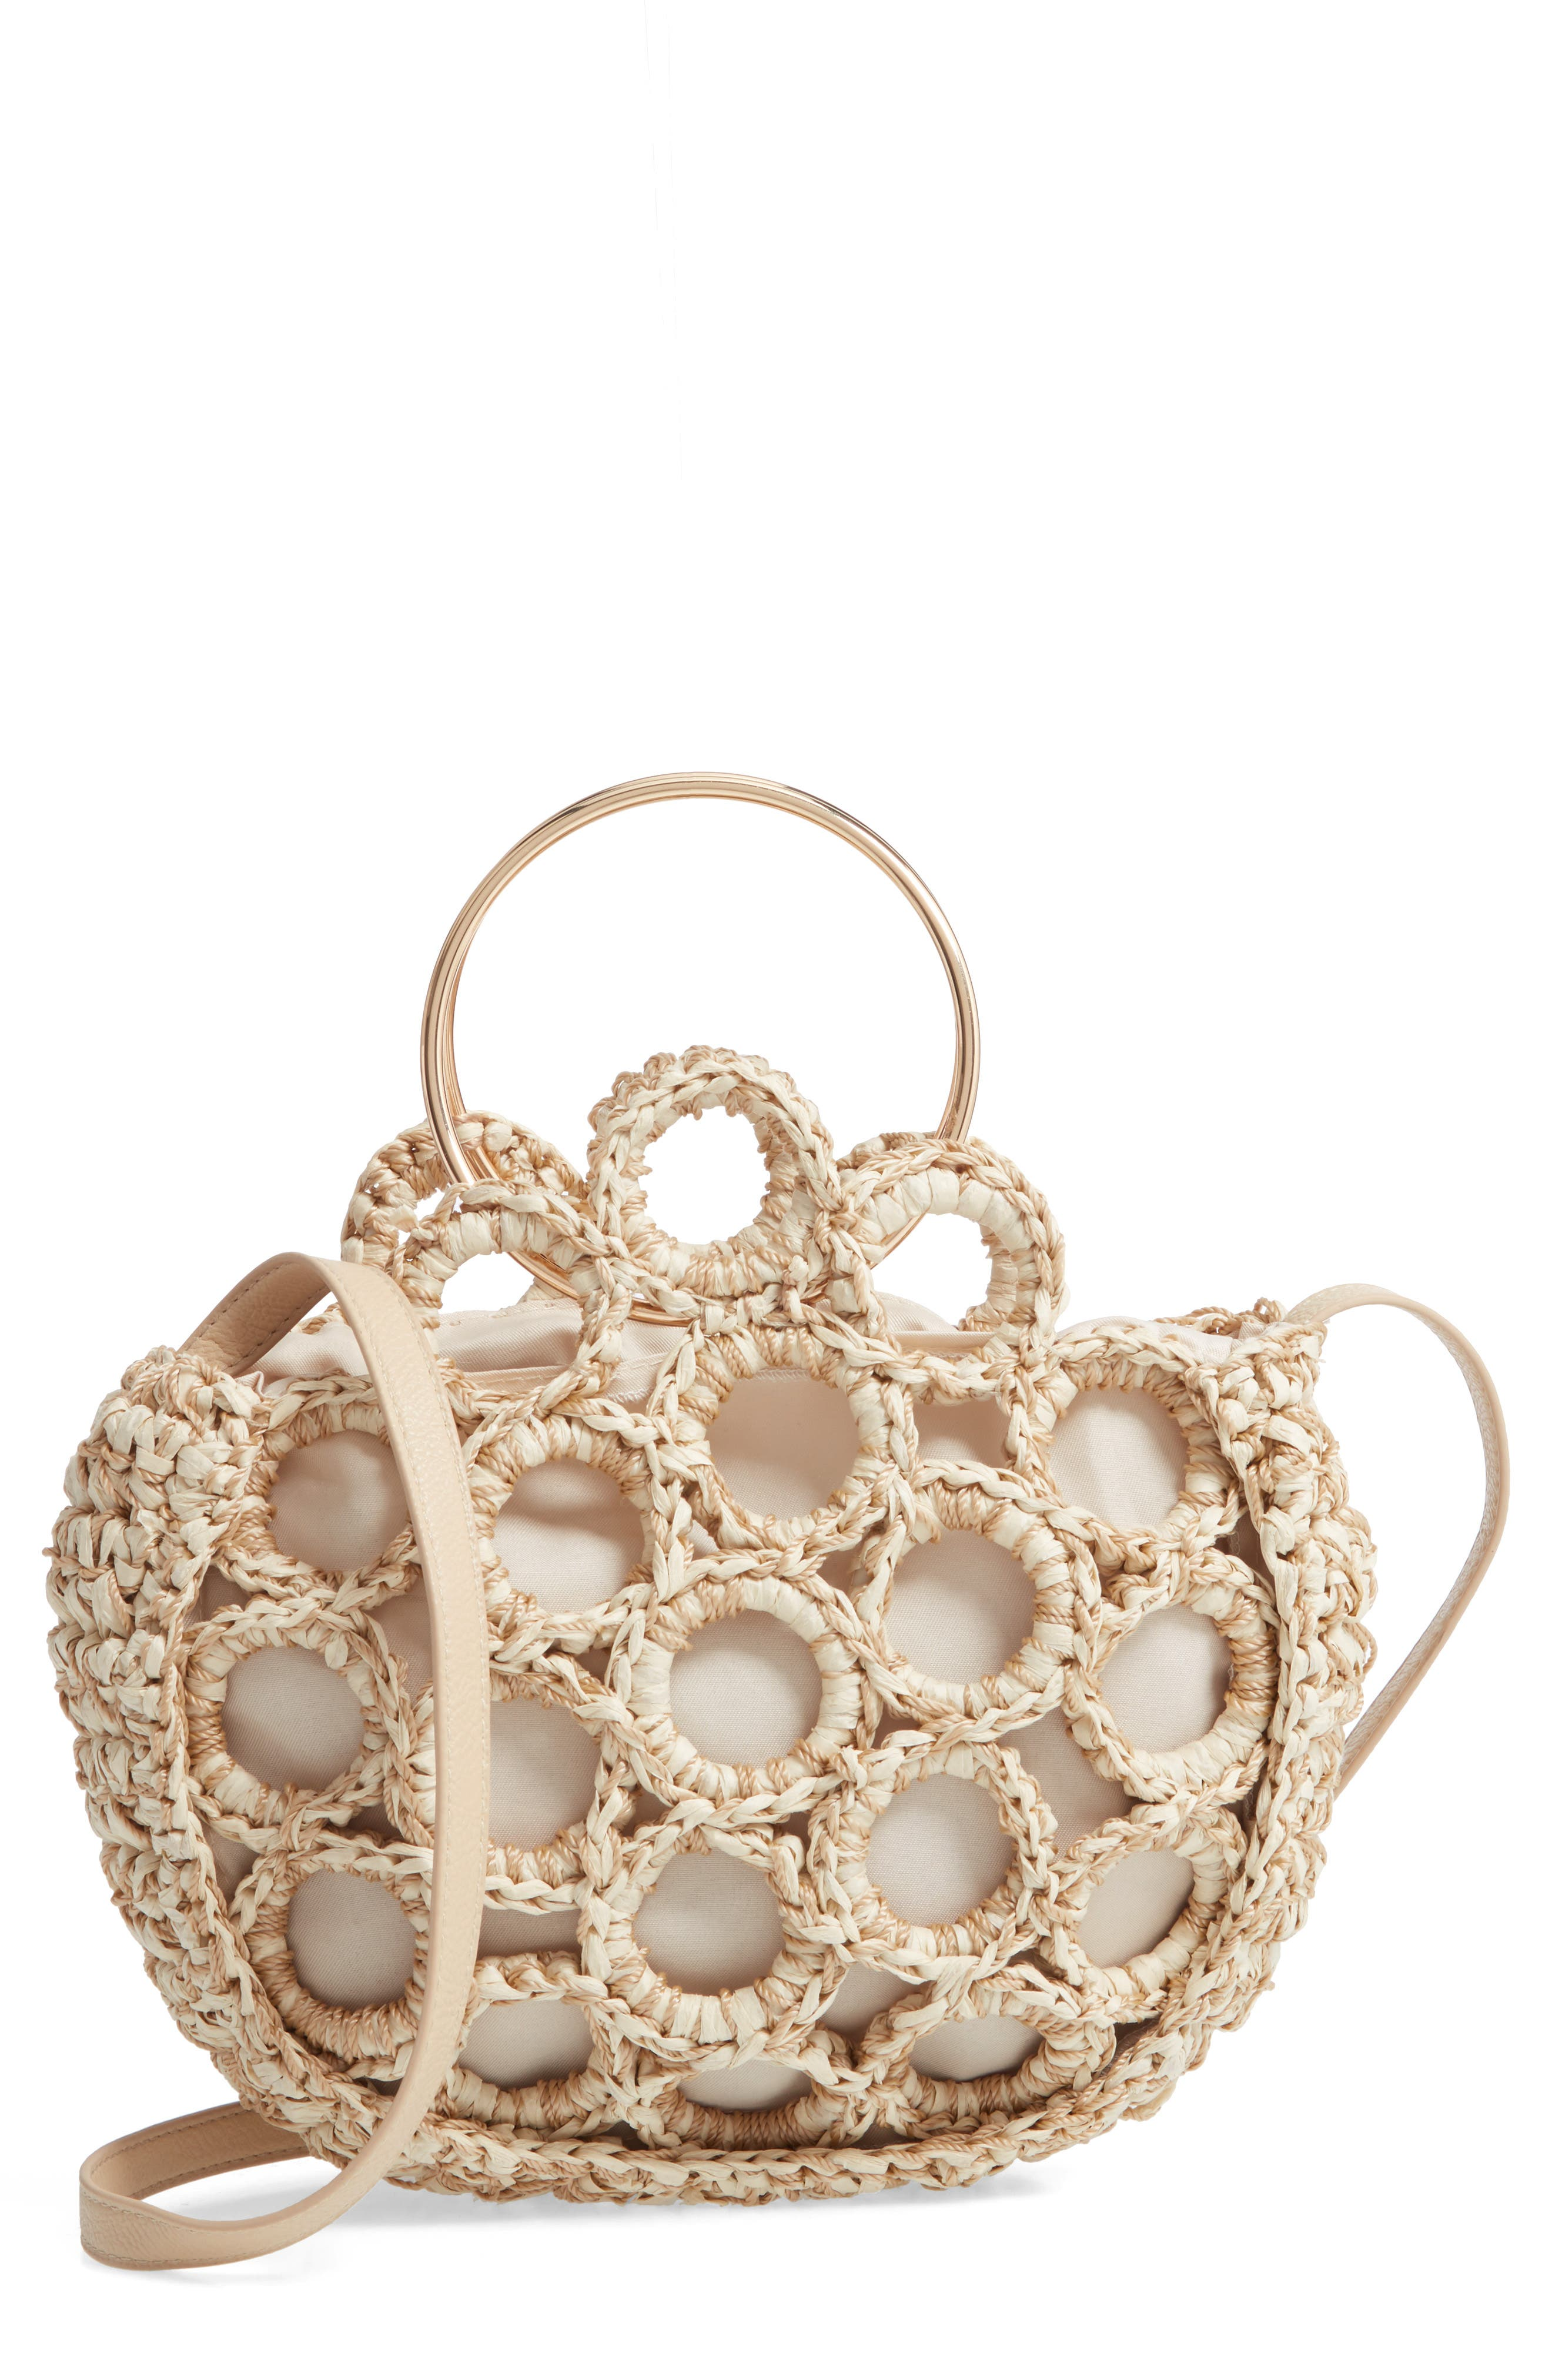 Mali + Lili Rachel Crochet Half Moon Bag